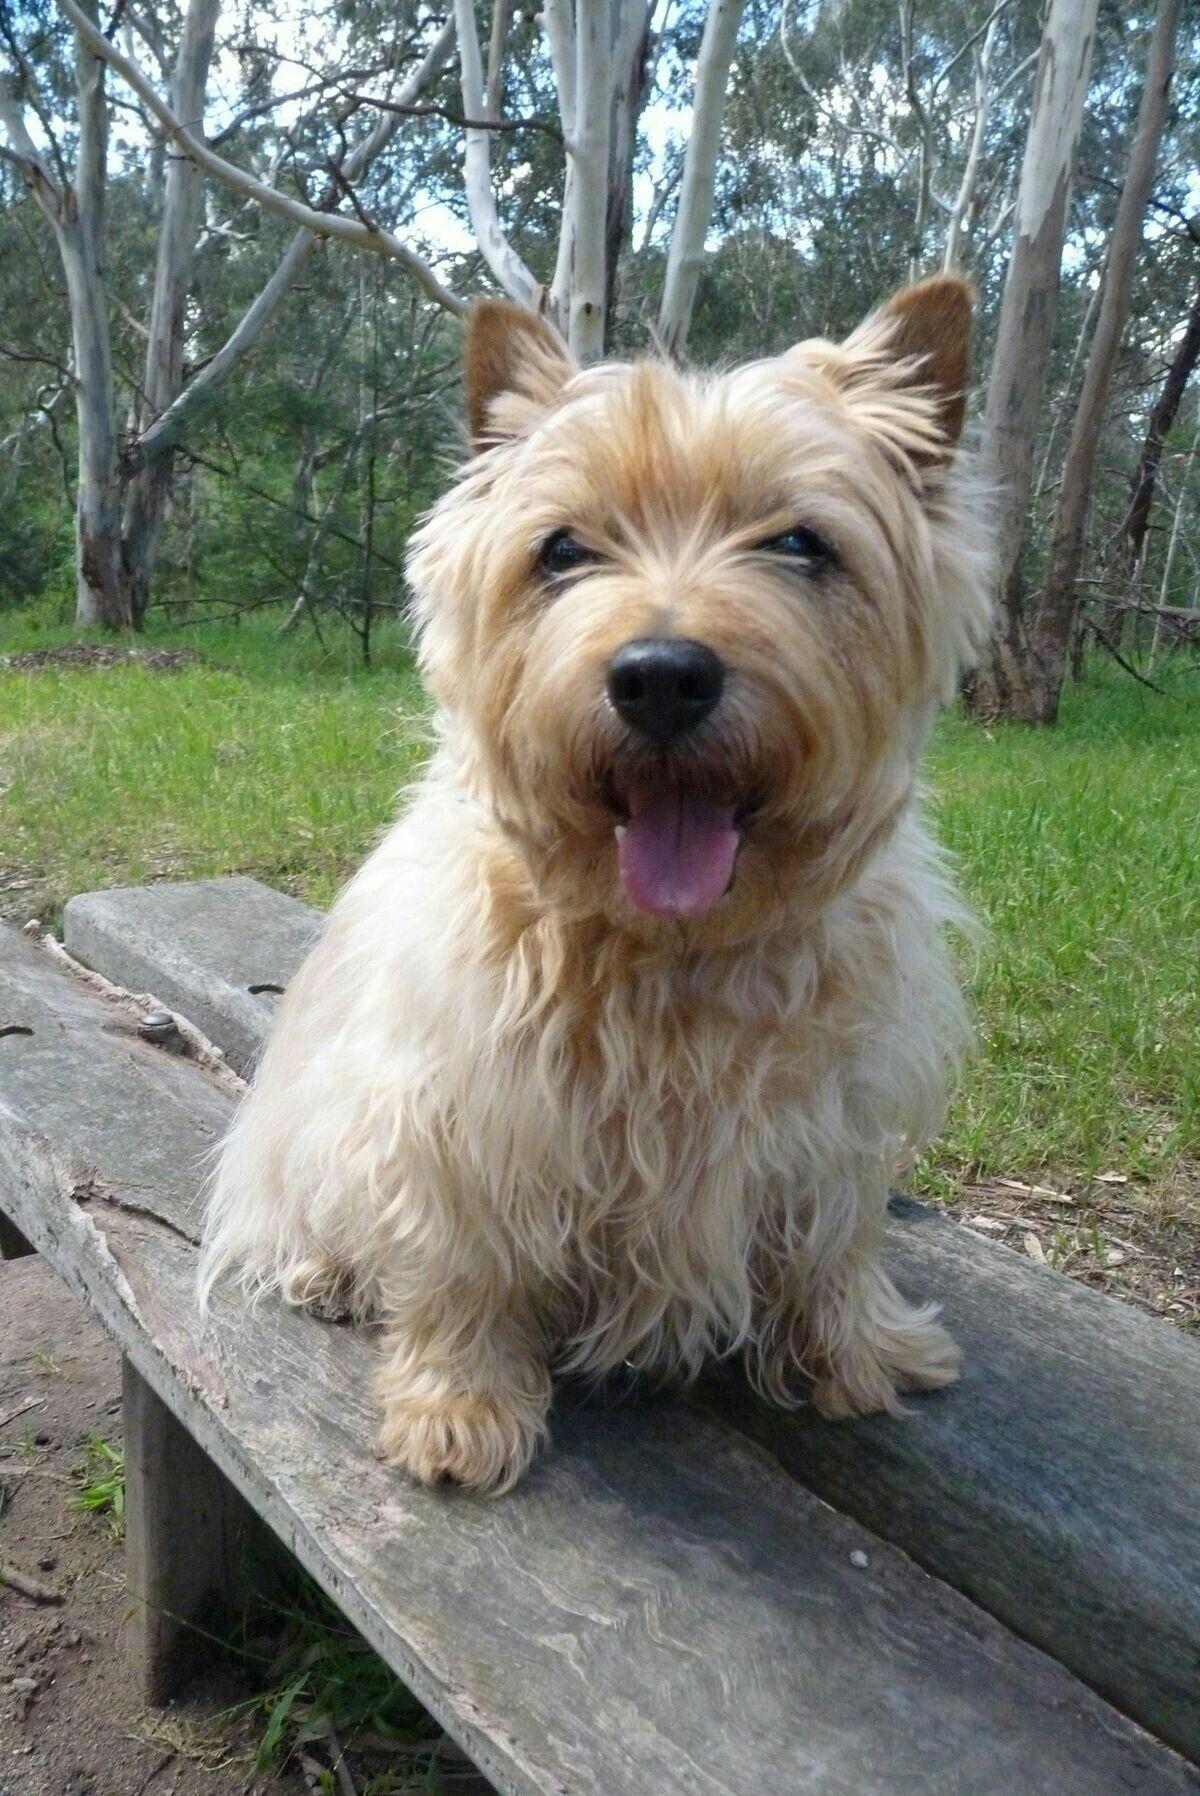 Cairn Terrier Scotland Cairn Terrier Terrier Breeds Norwich